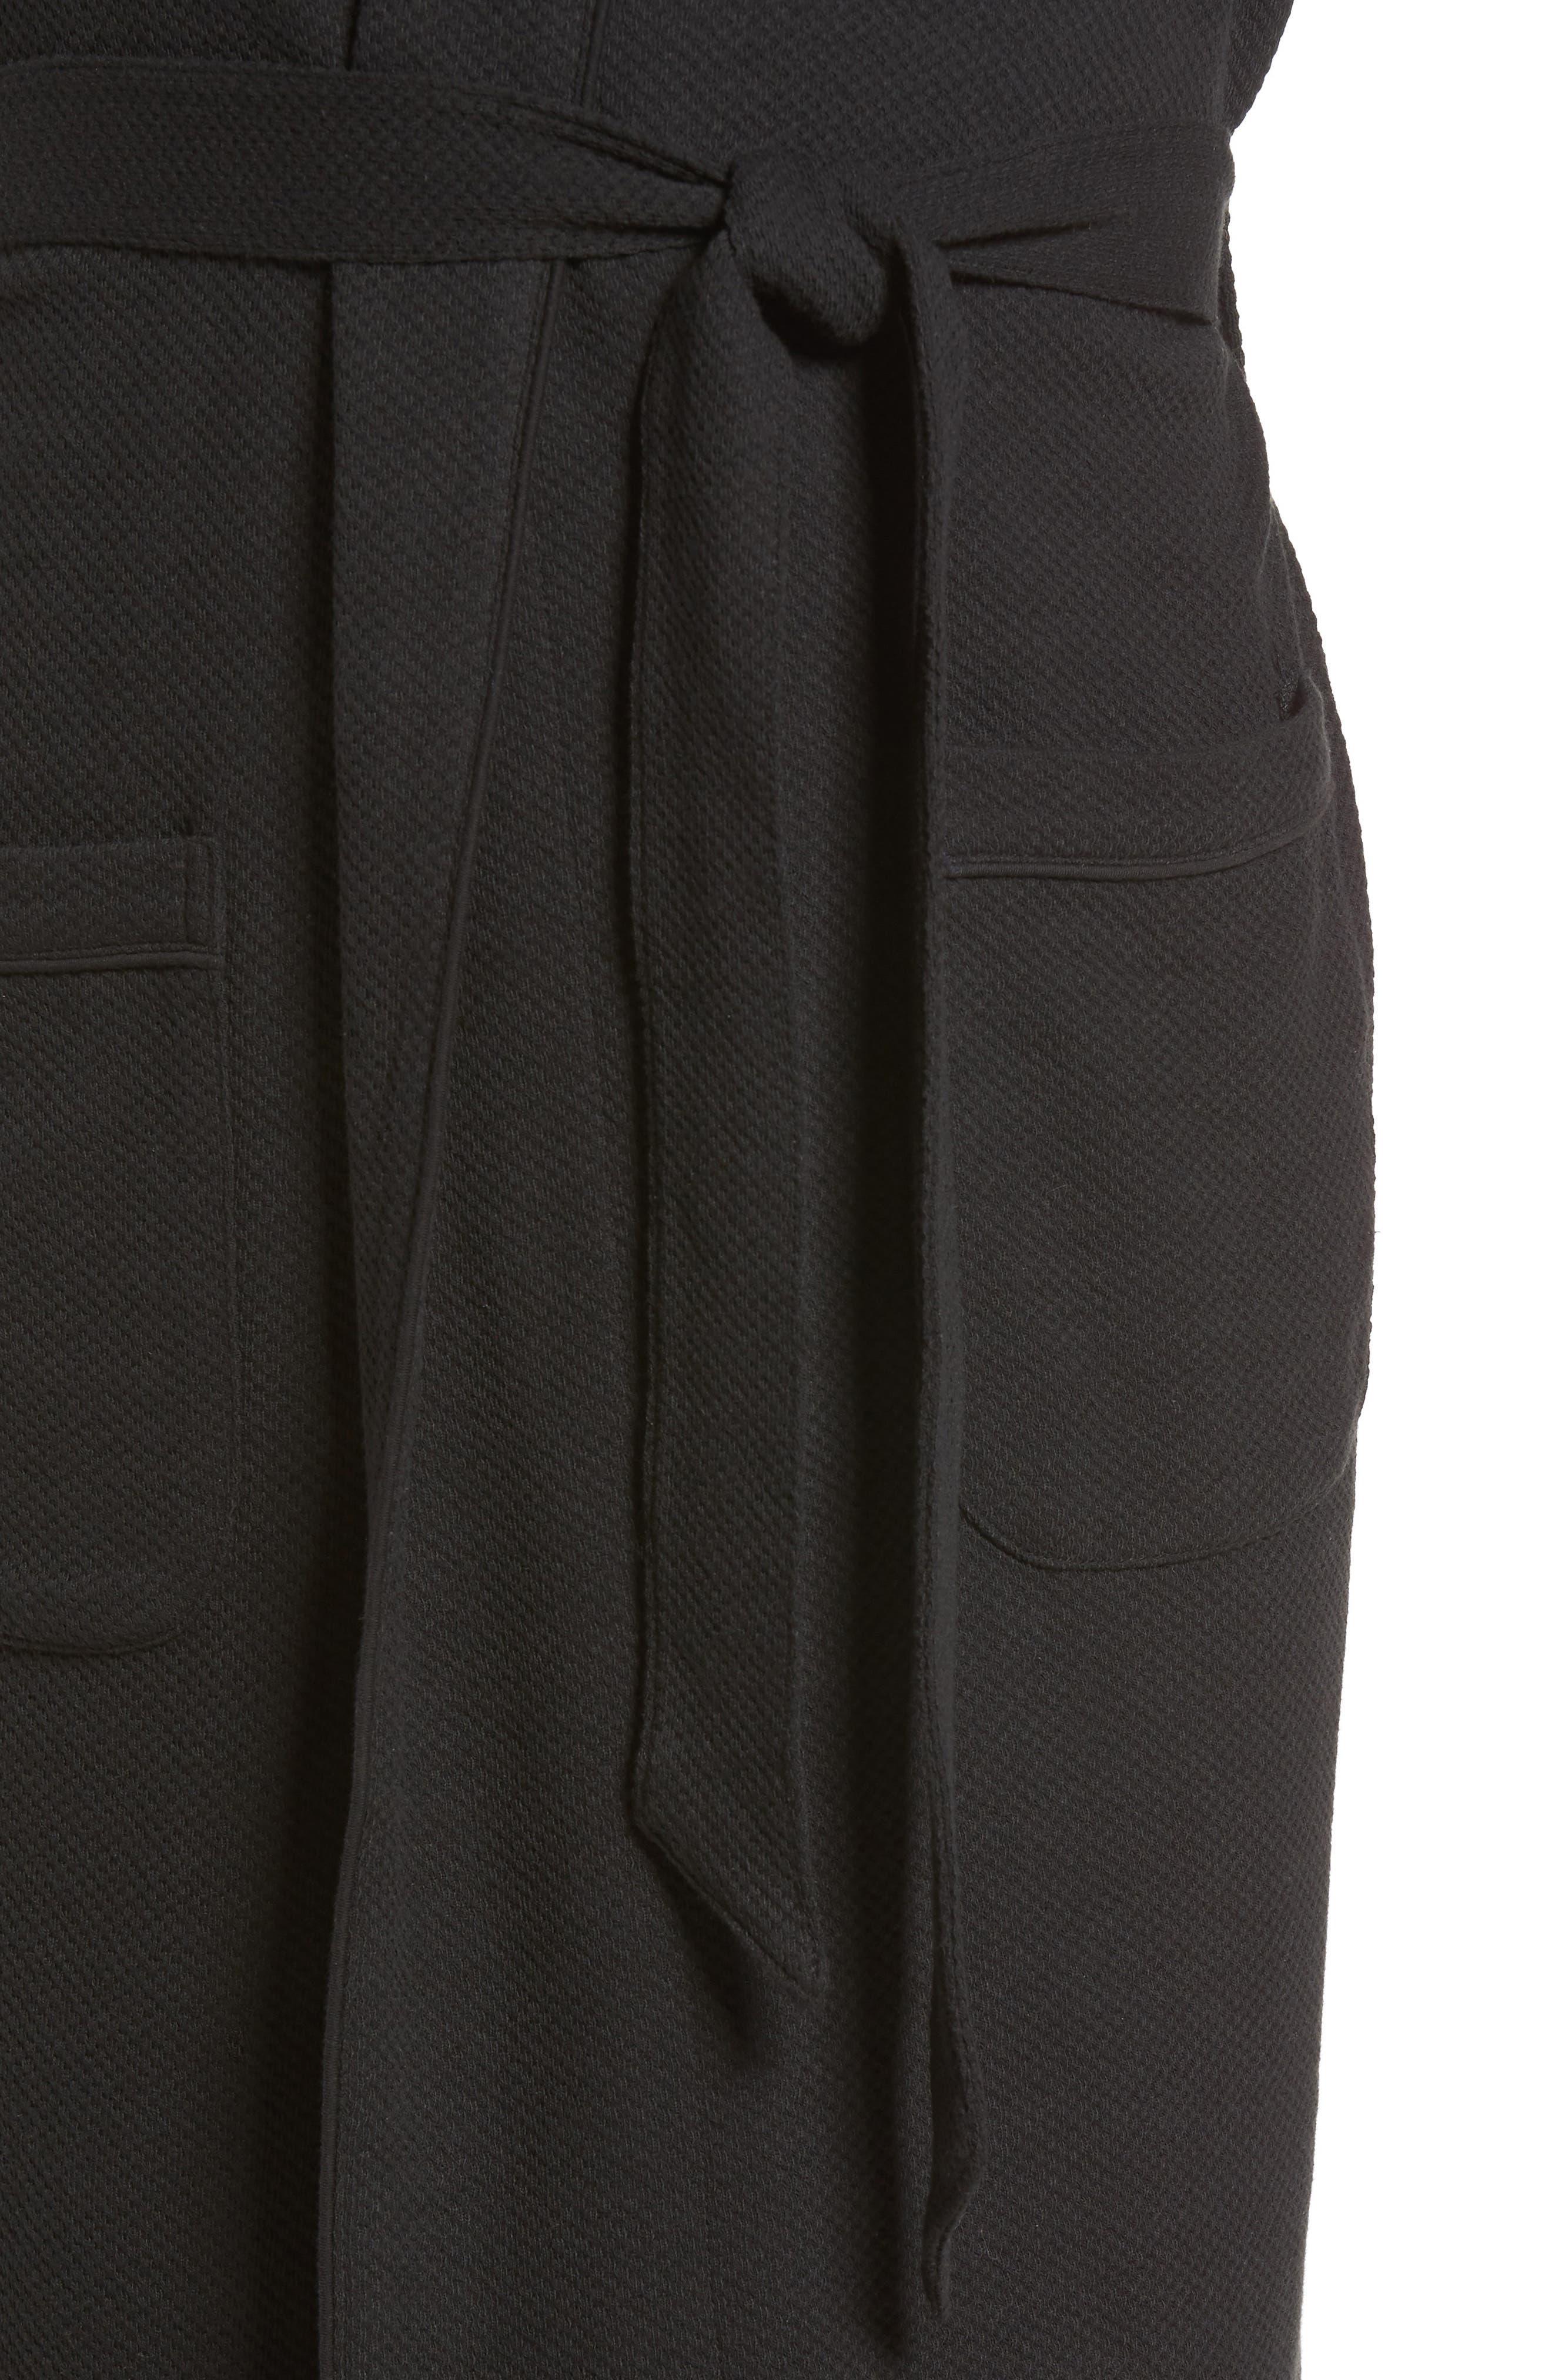 NORDSTROM MEN'S SHOP, Thermal Robe, Alternate thumbnail 4, color, 001